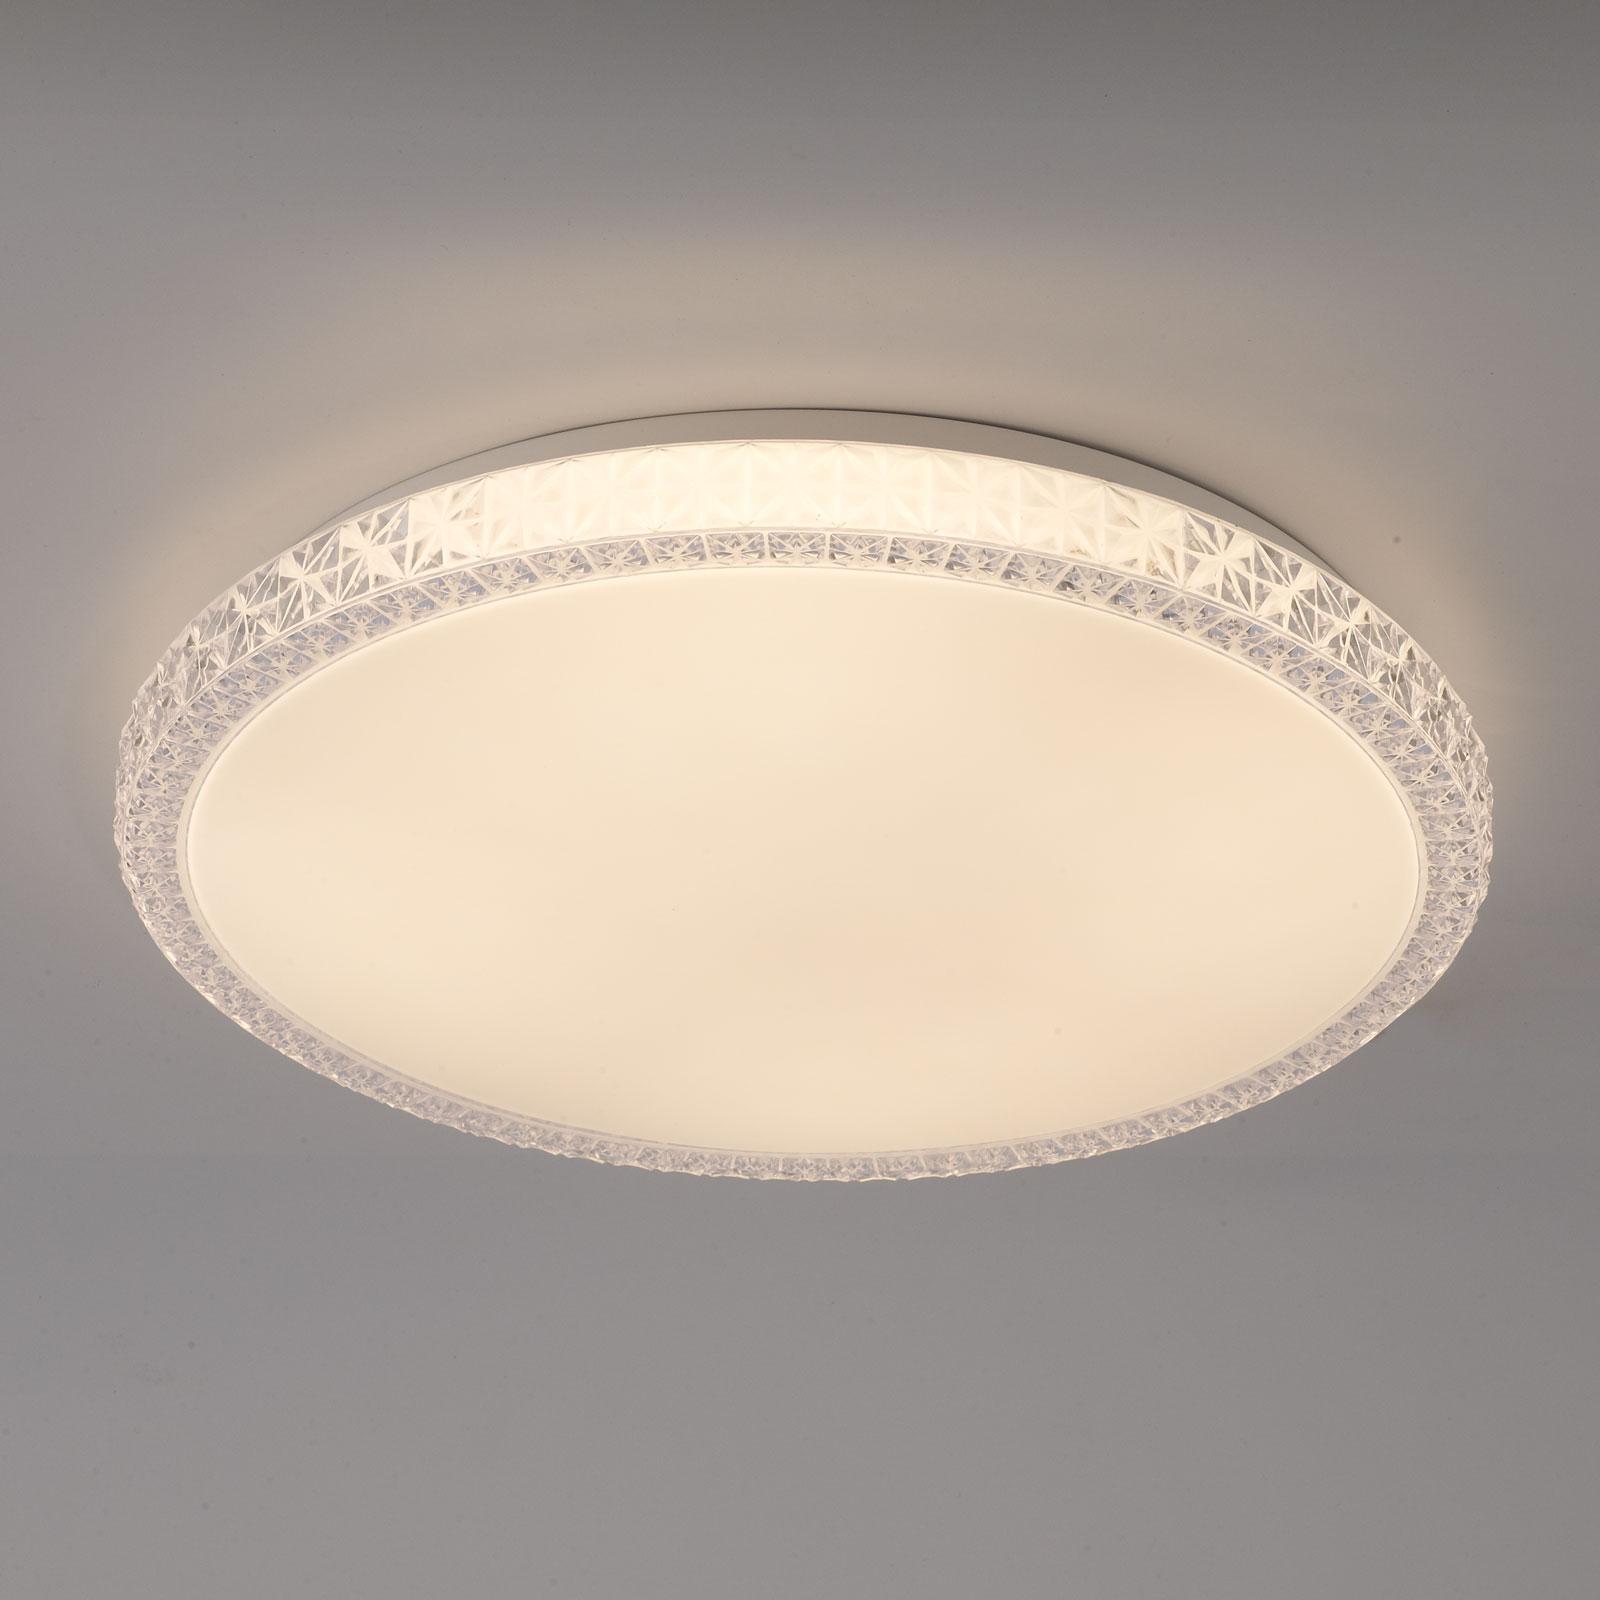 Naxos LED-taklampe, dimbar, fargevekslende hvit